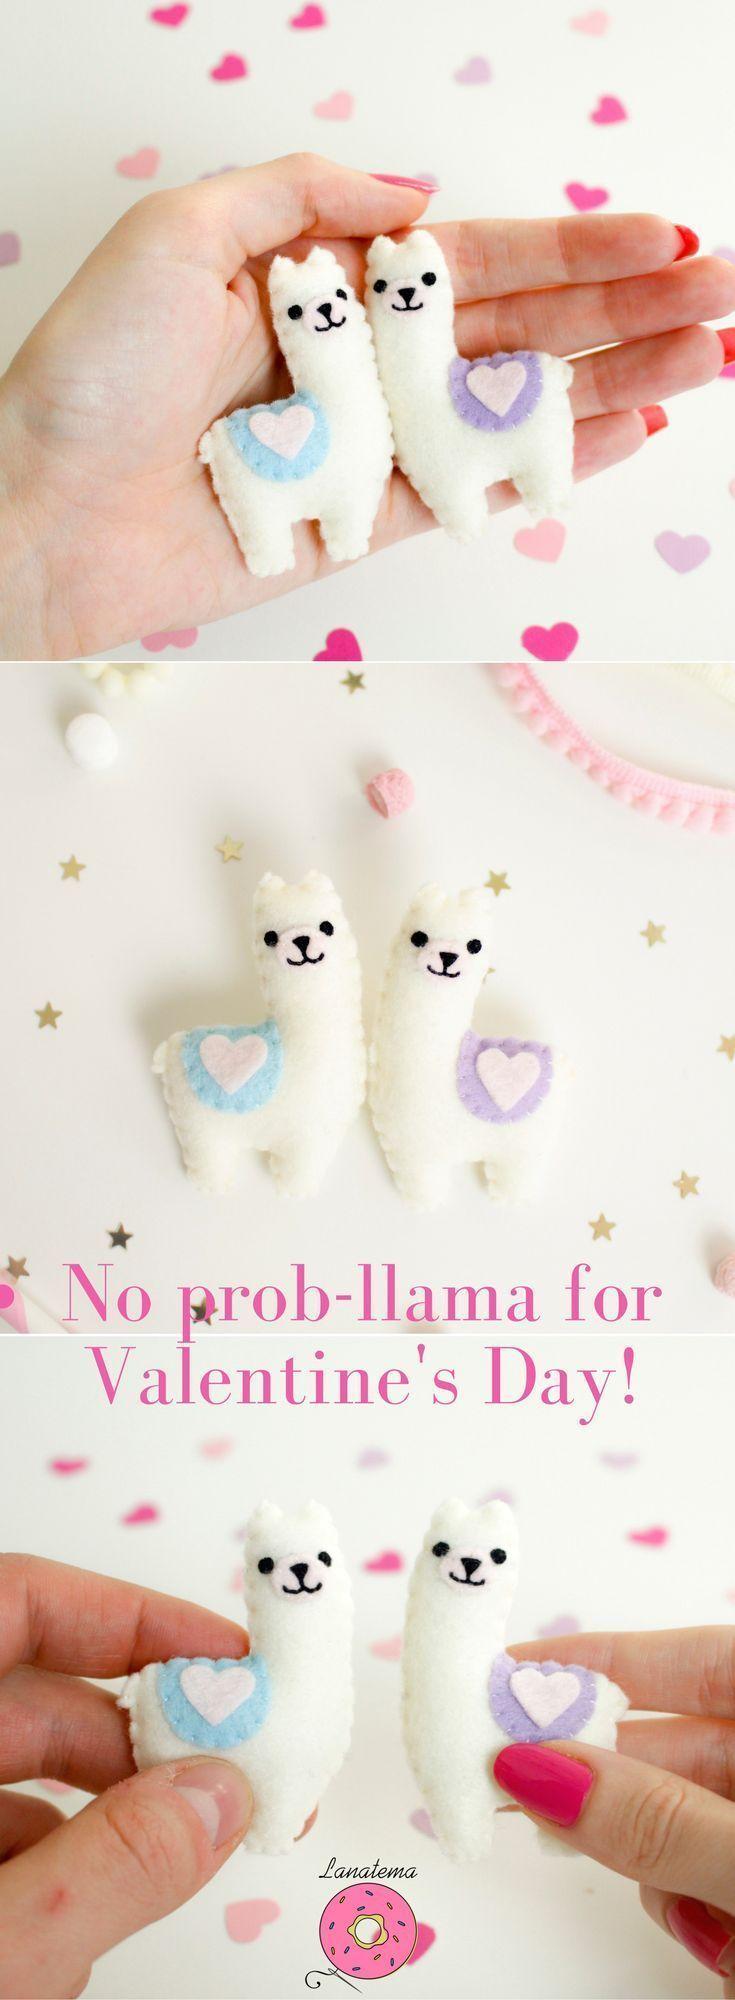 Llama ornament llama keychain alpaca funny llama gift, gift for sister, white elephant holiday stocking, pastel christmas tree